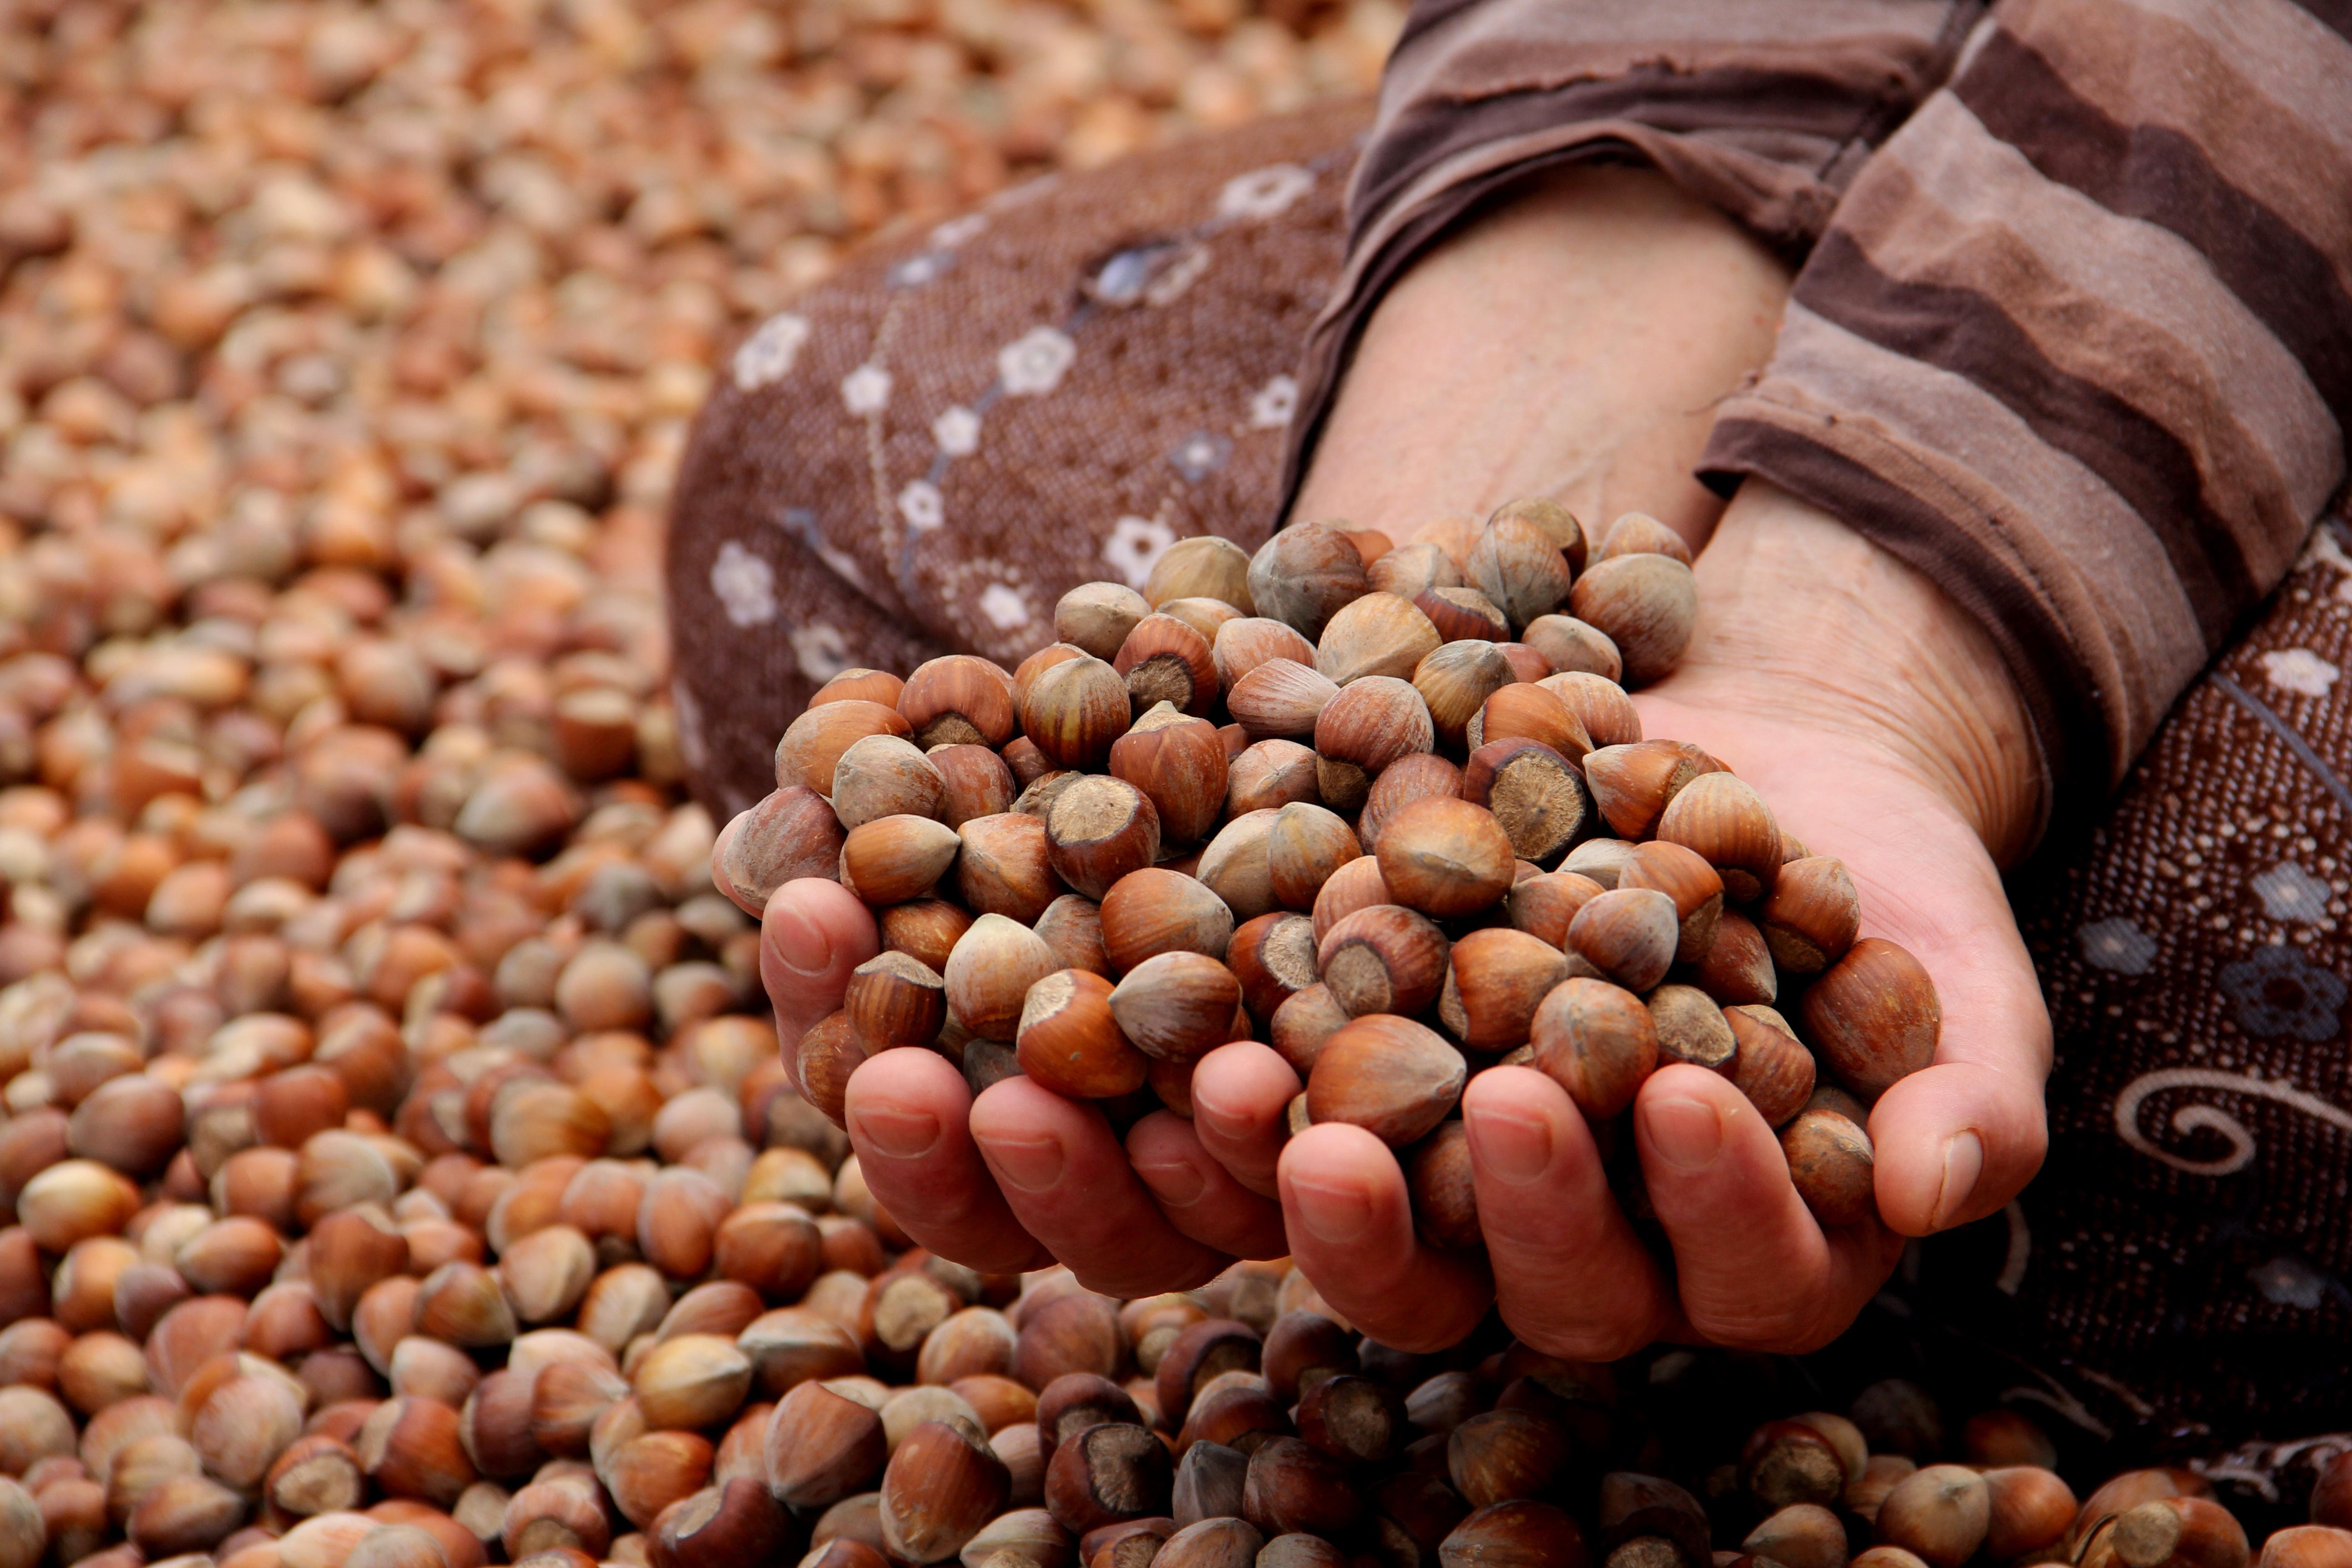 Announcement from Turkish Grain Board for Hazelnut Sales